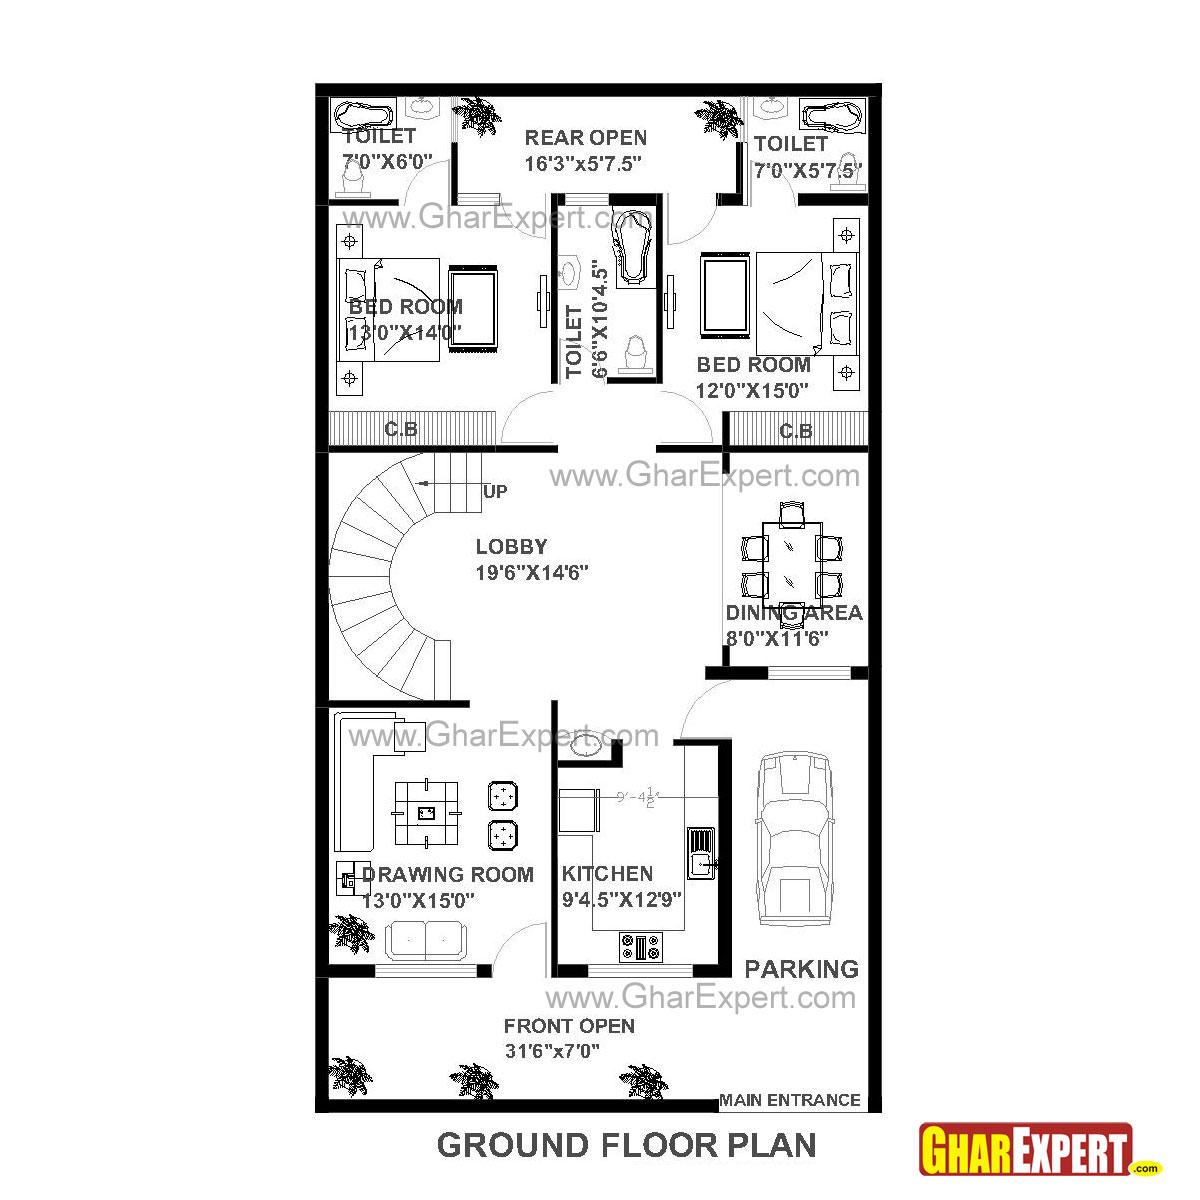 House Plan Of 30 Feet By 60 Feet Plot Squre Feet